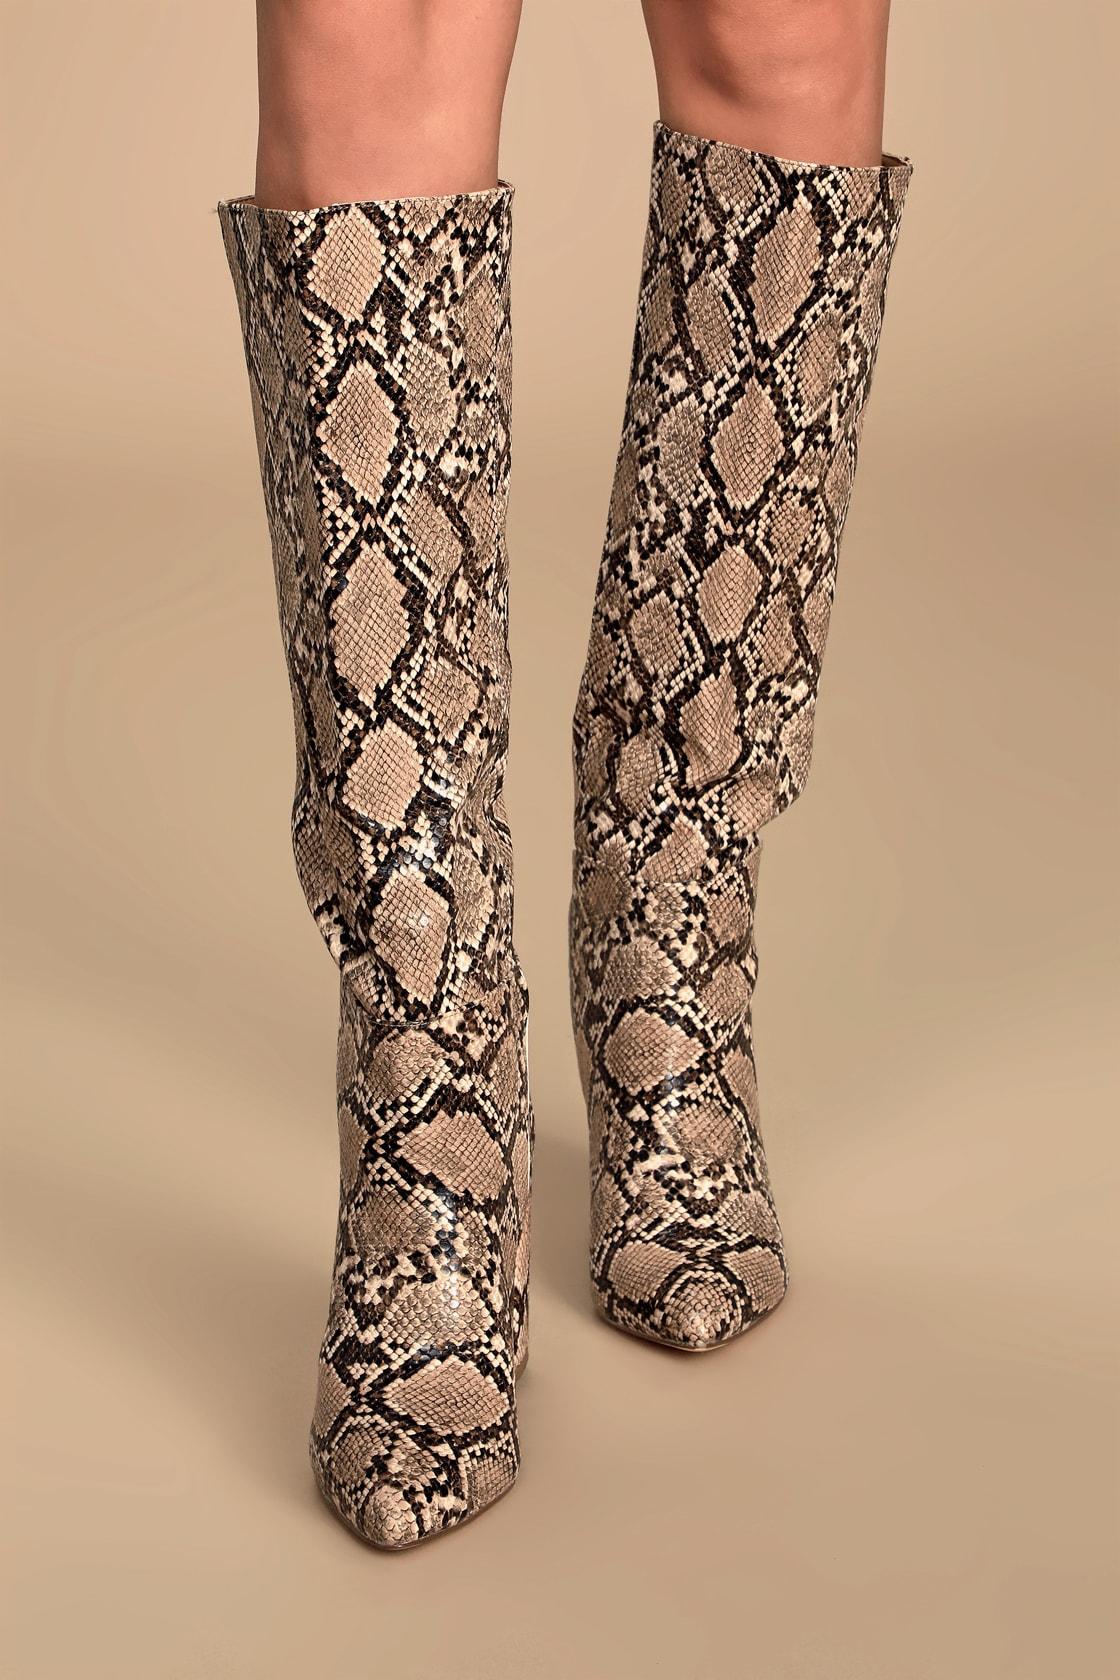 Katari Tan Snake Pointed-Toe Knee High Boots